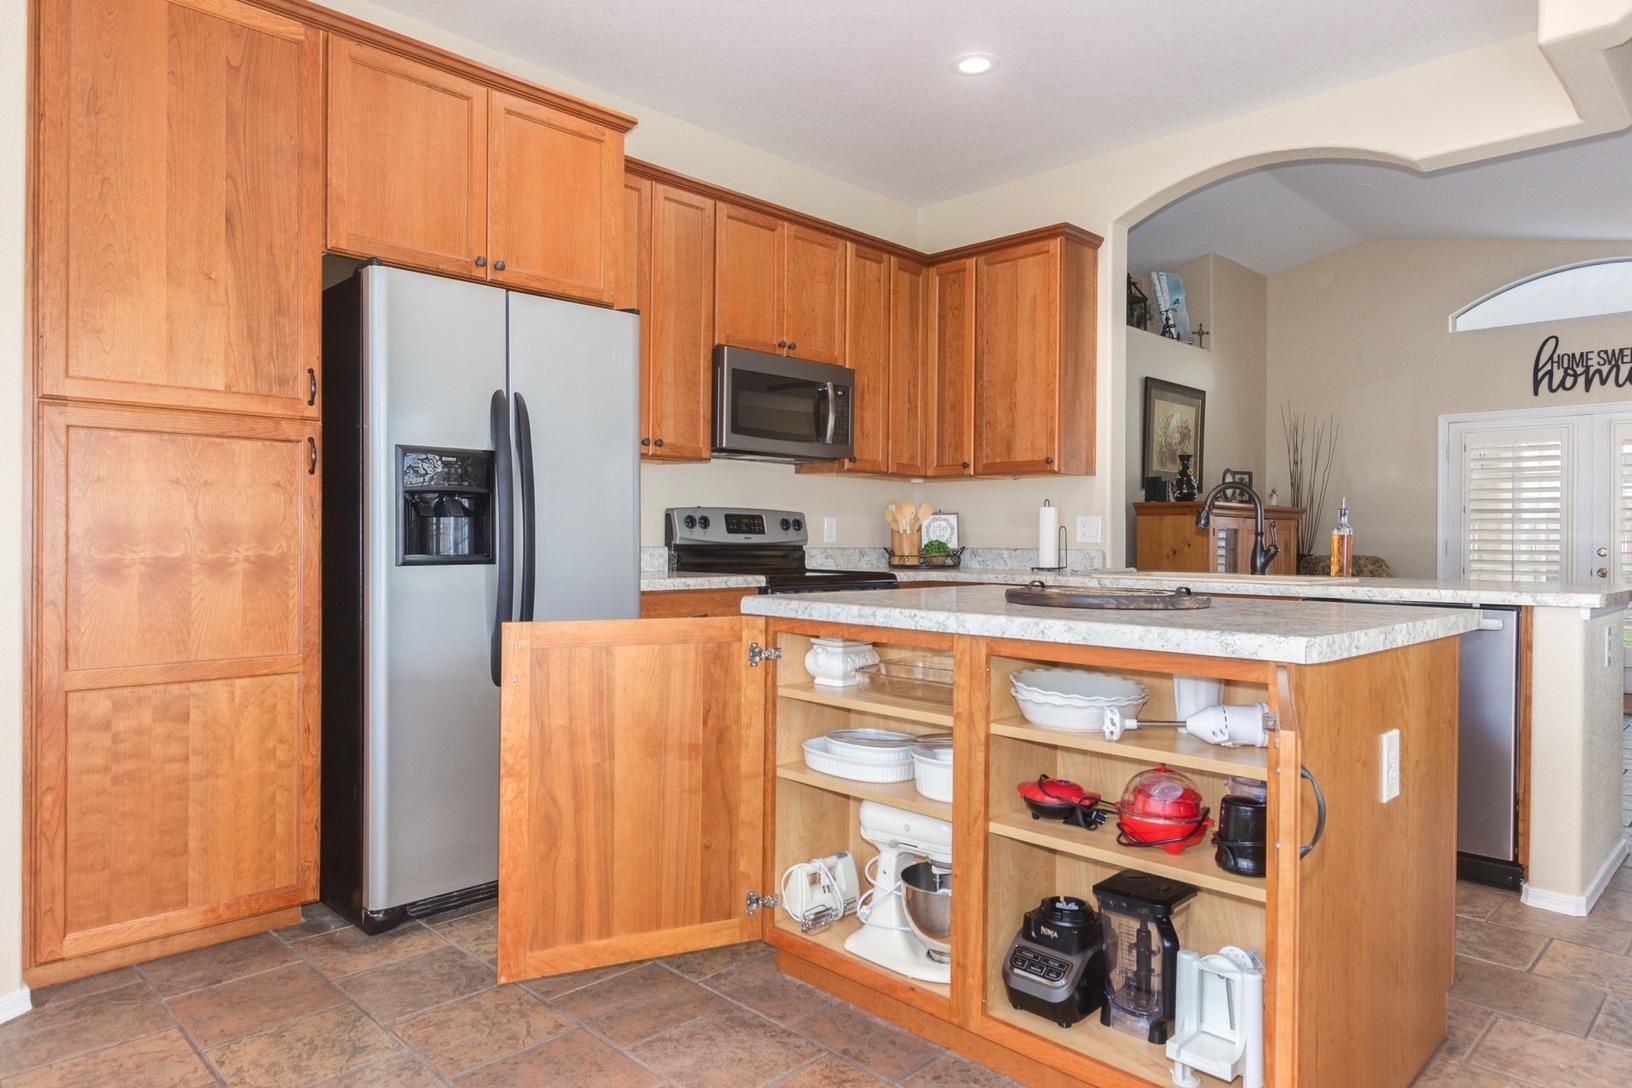 Remodeling - Kitchen Remodel in Glendale - Kitchen Remodel ...